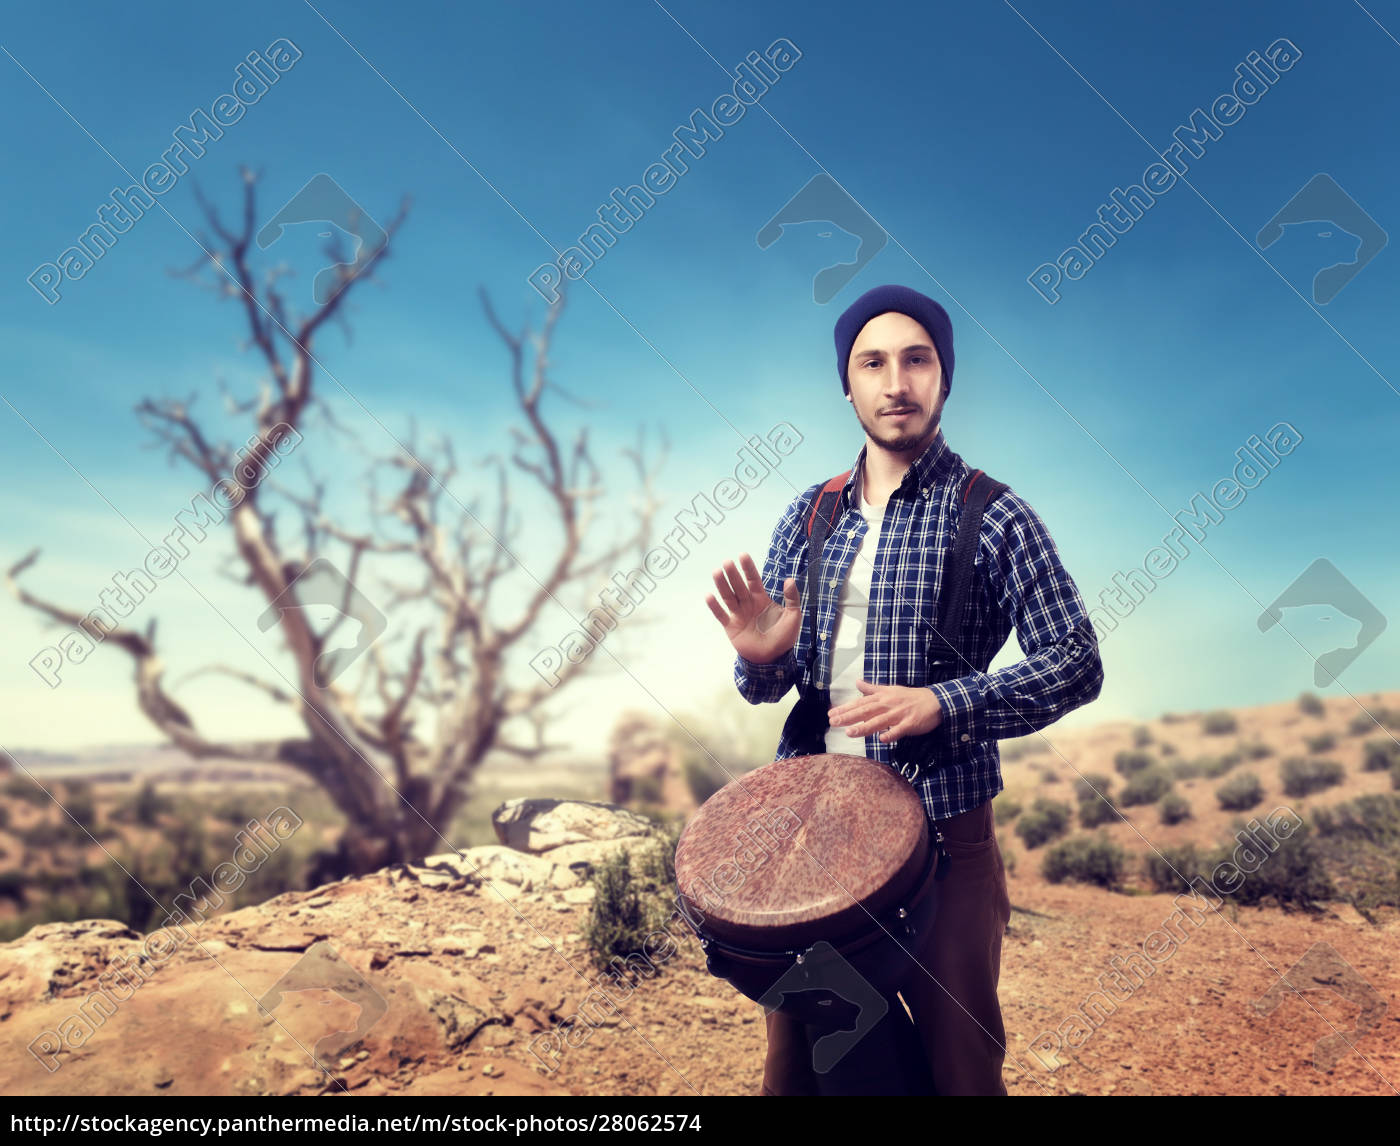 drummer, plays, on, wooden, bongo, drums - 28062574